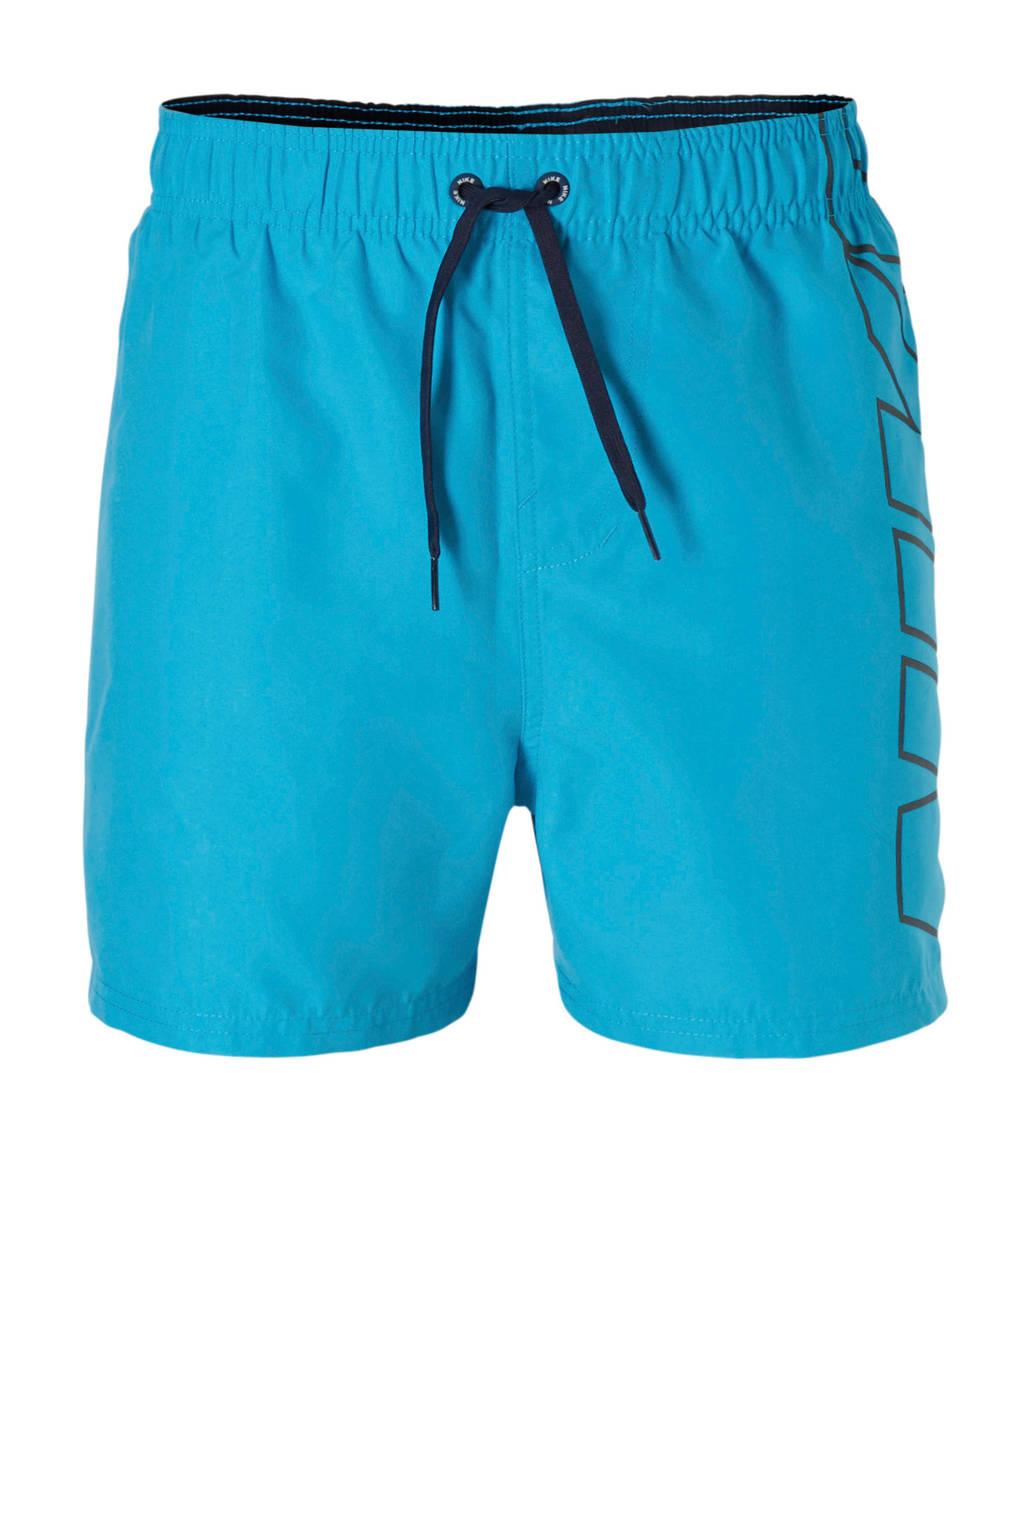 Nike zwemshort met merknaam blauw, Blauw